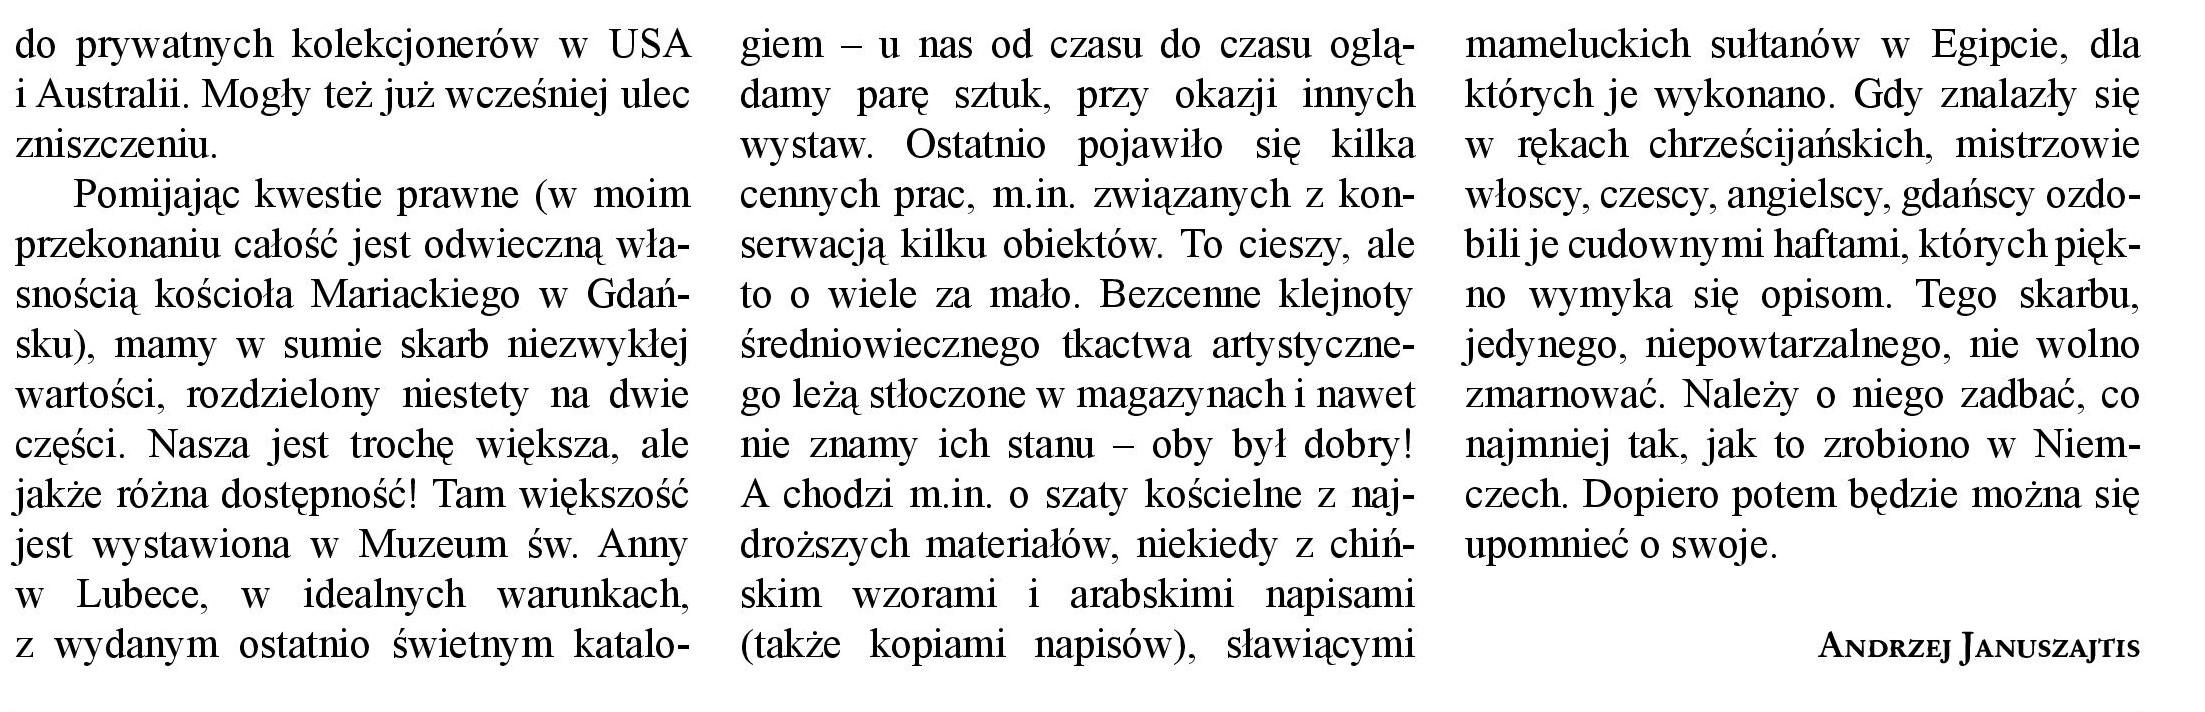 NG I 2021 do netu-page-006 koscioly 4